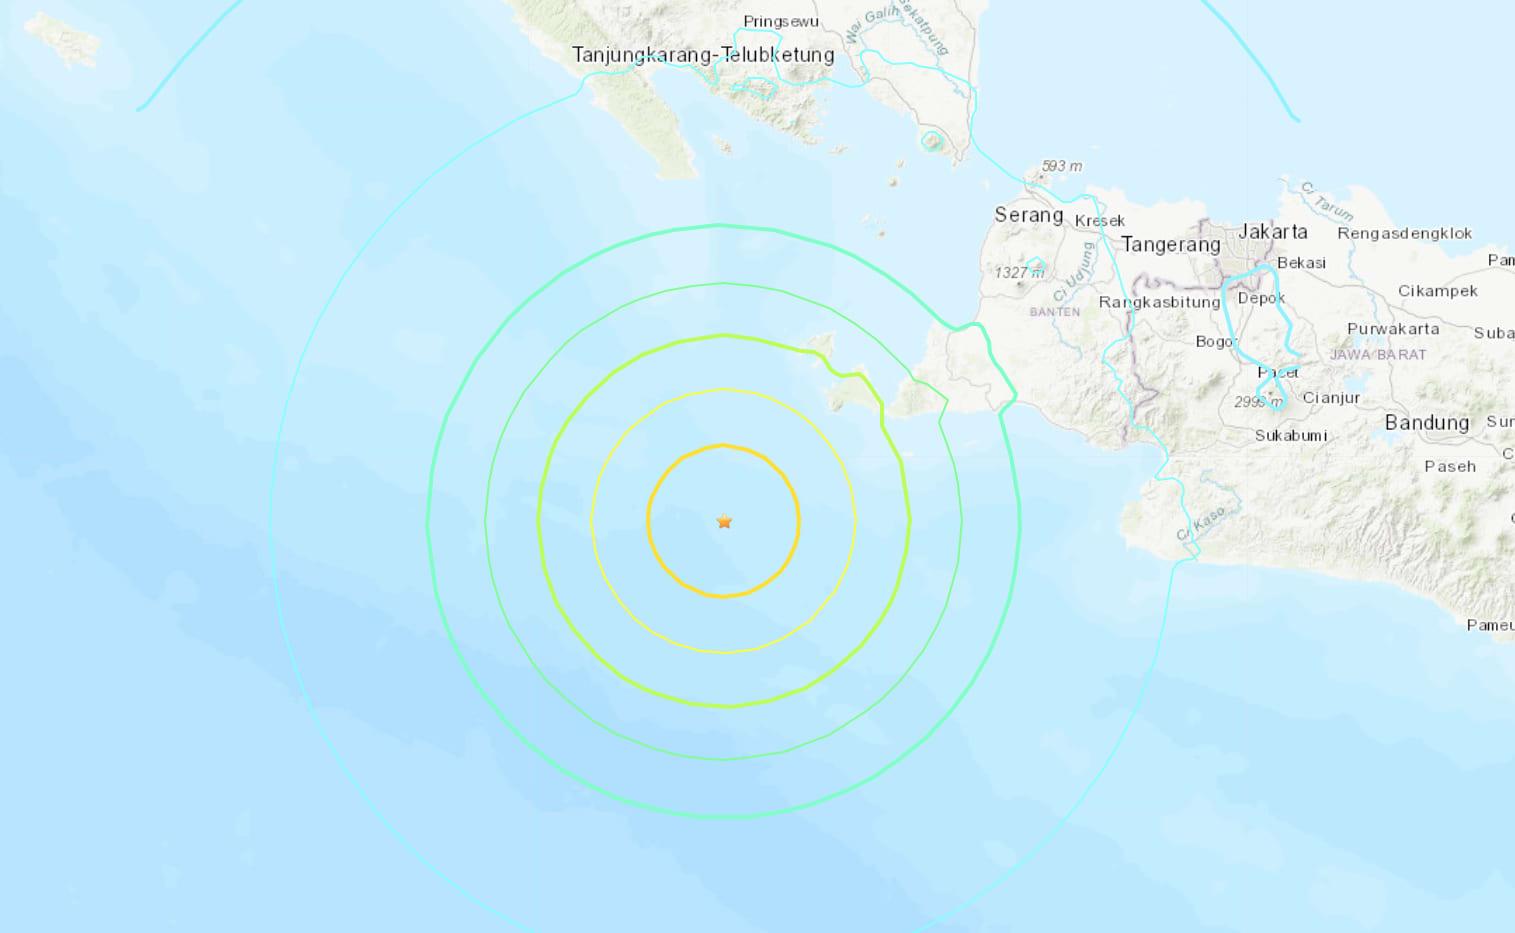 Tsunami warning for parts of Indonesia's Sumatra, Java after strong quake